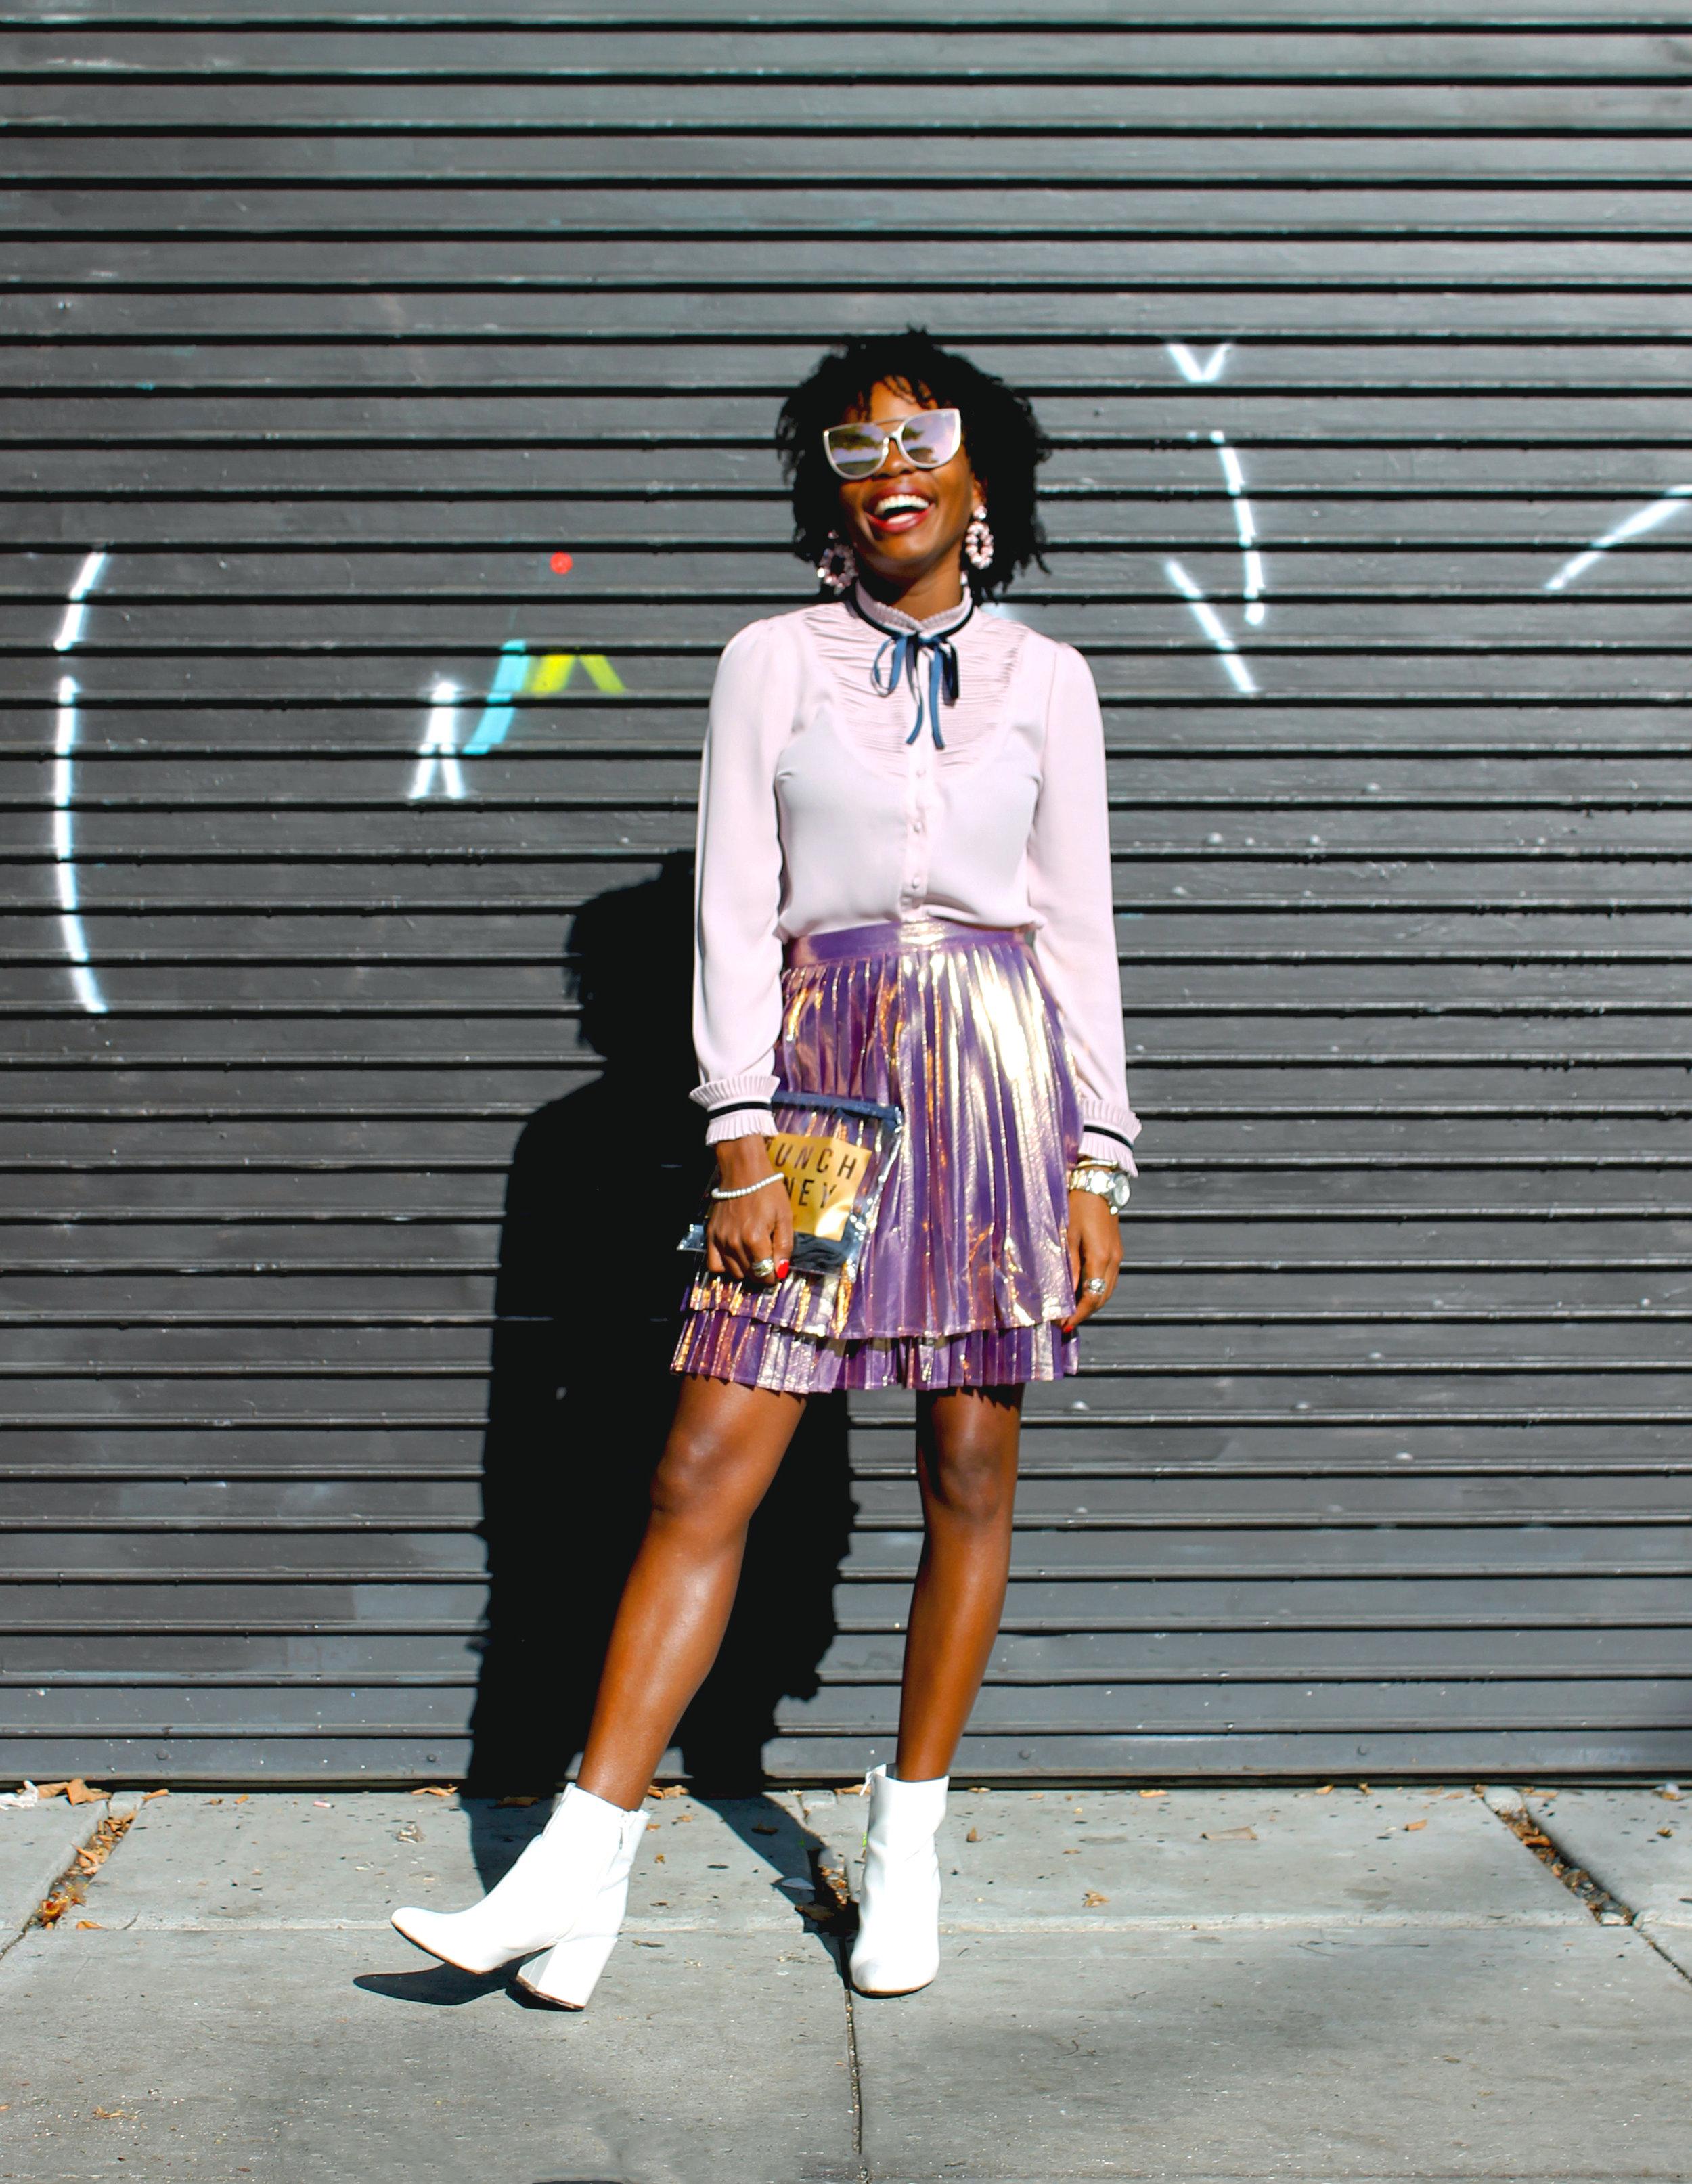 Shirt:  ModCloth ; Skirt:  ModCloth ; Boots: Urban Outfitters; Sunglasses: Quay; Earrings: BaubleBar